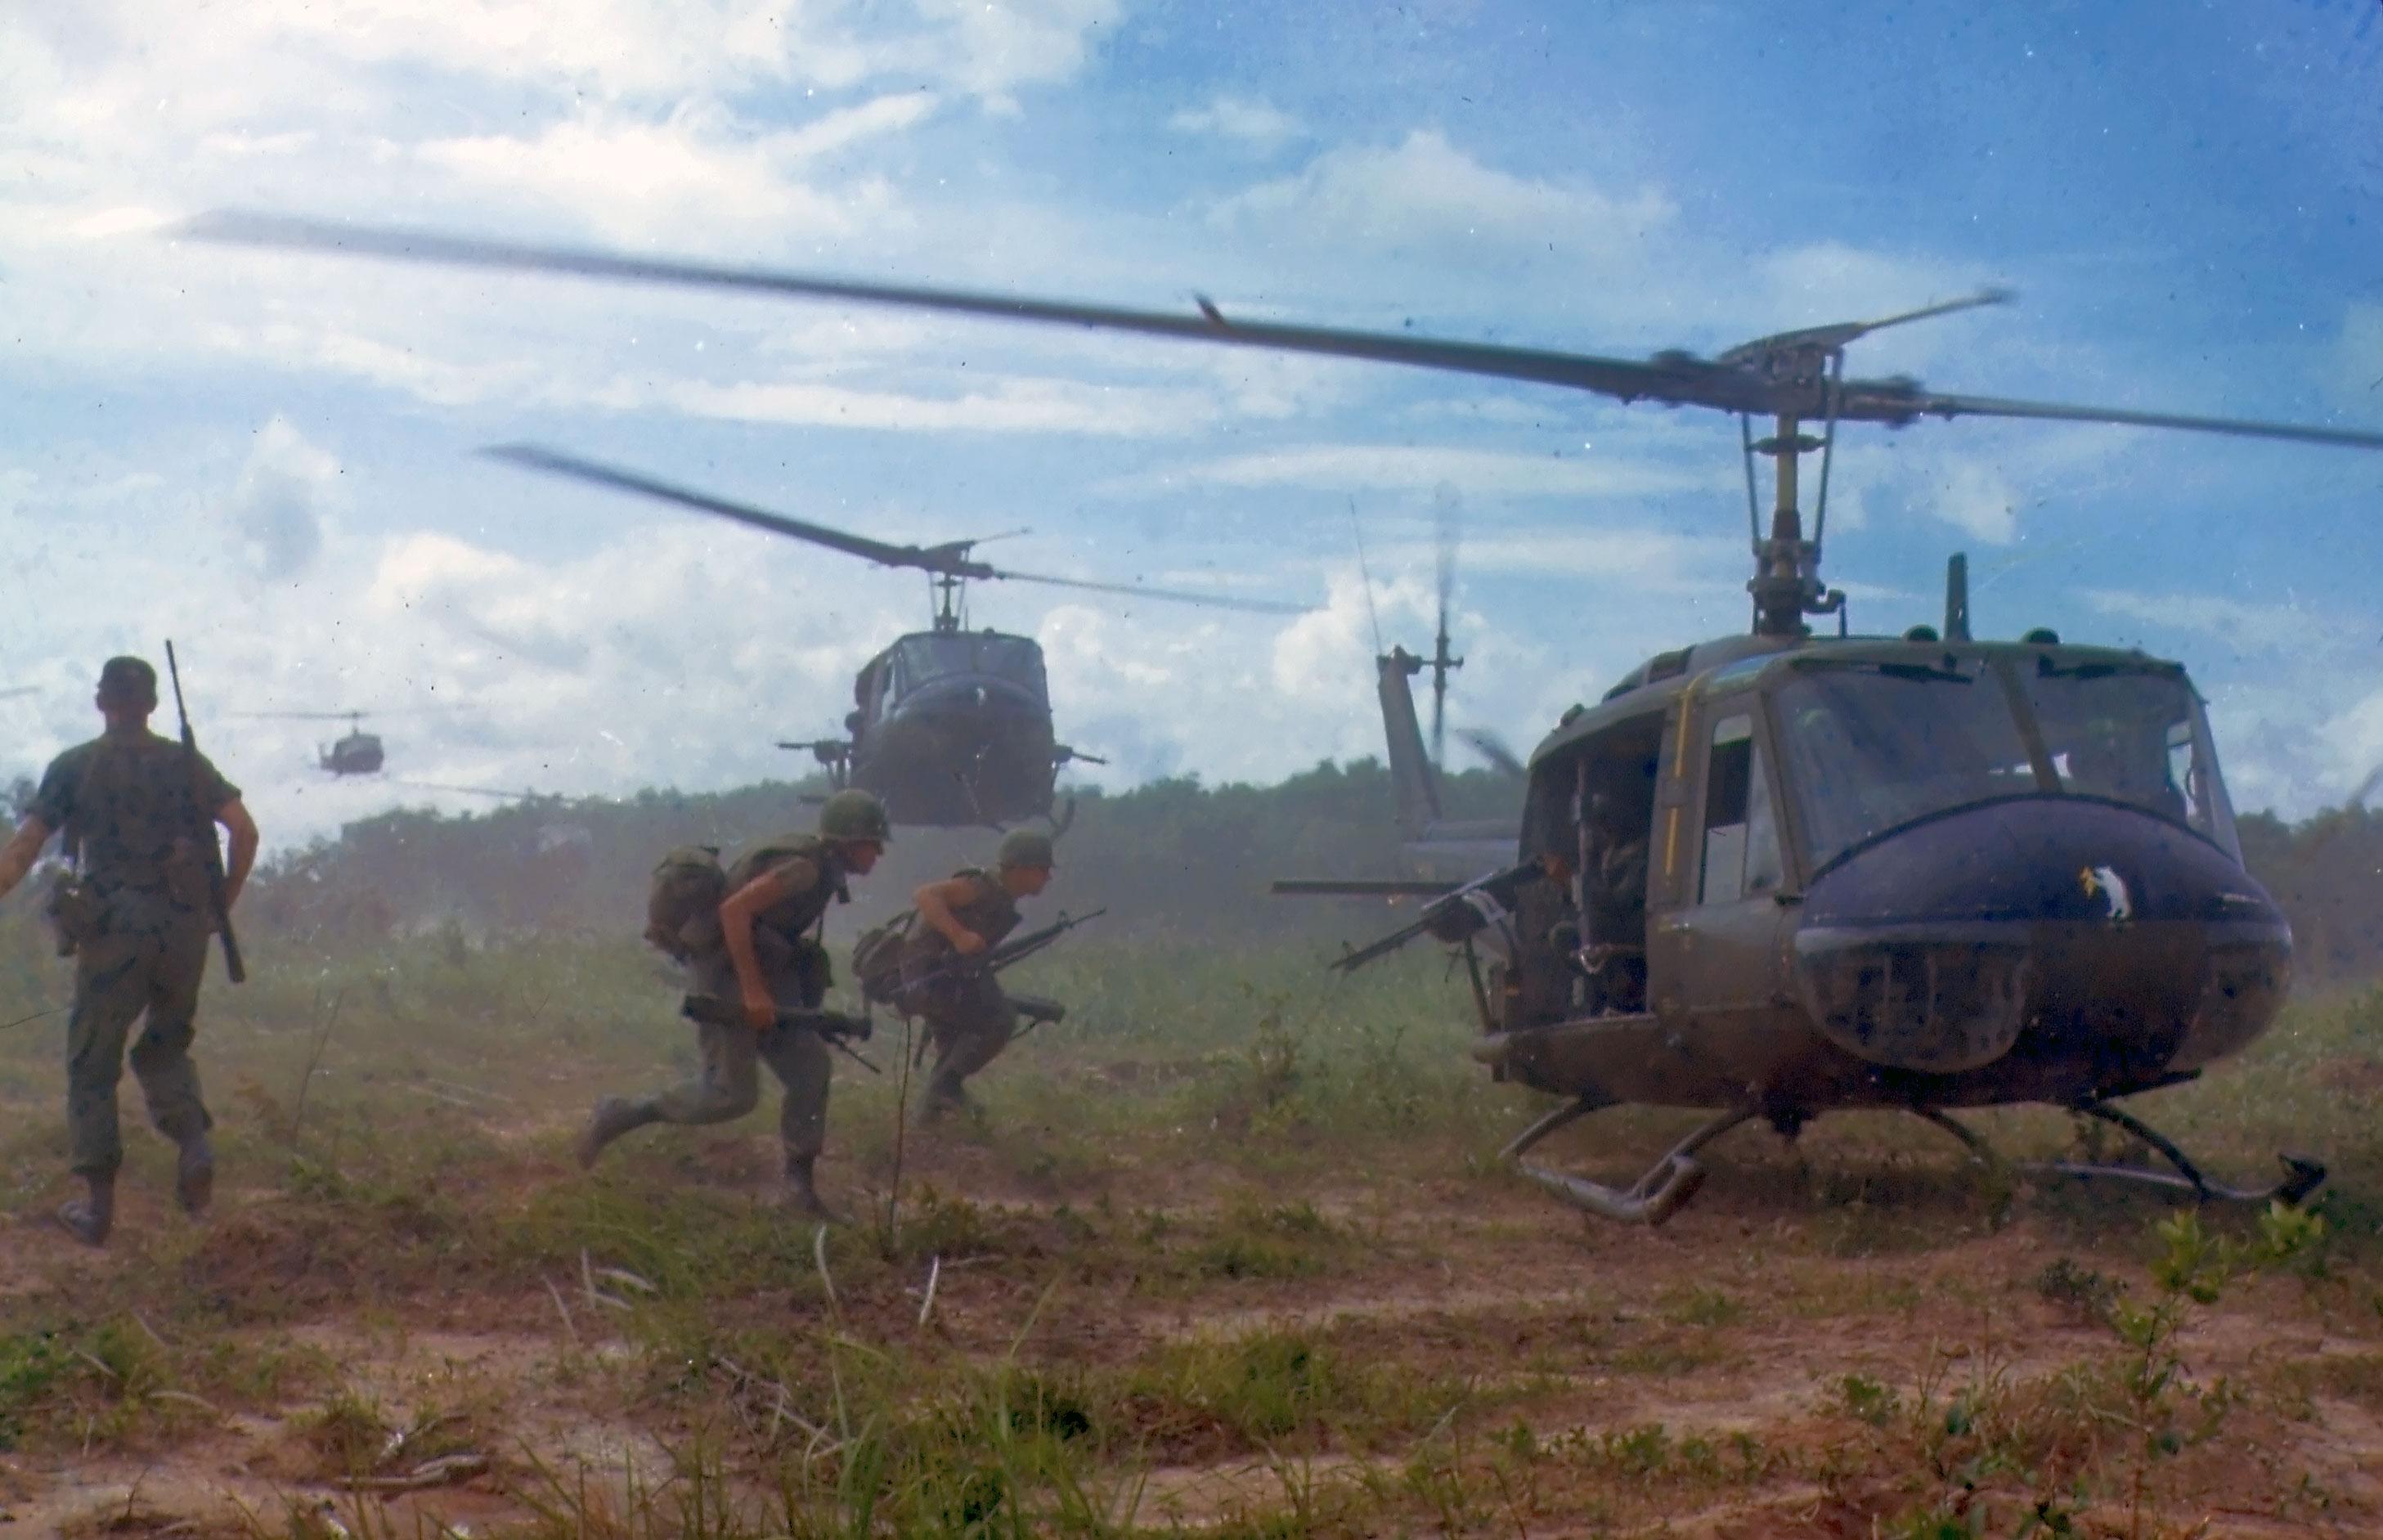 المشاة UH-1D_helicopters_in_Vietnam_1966